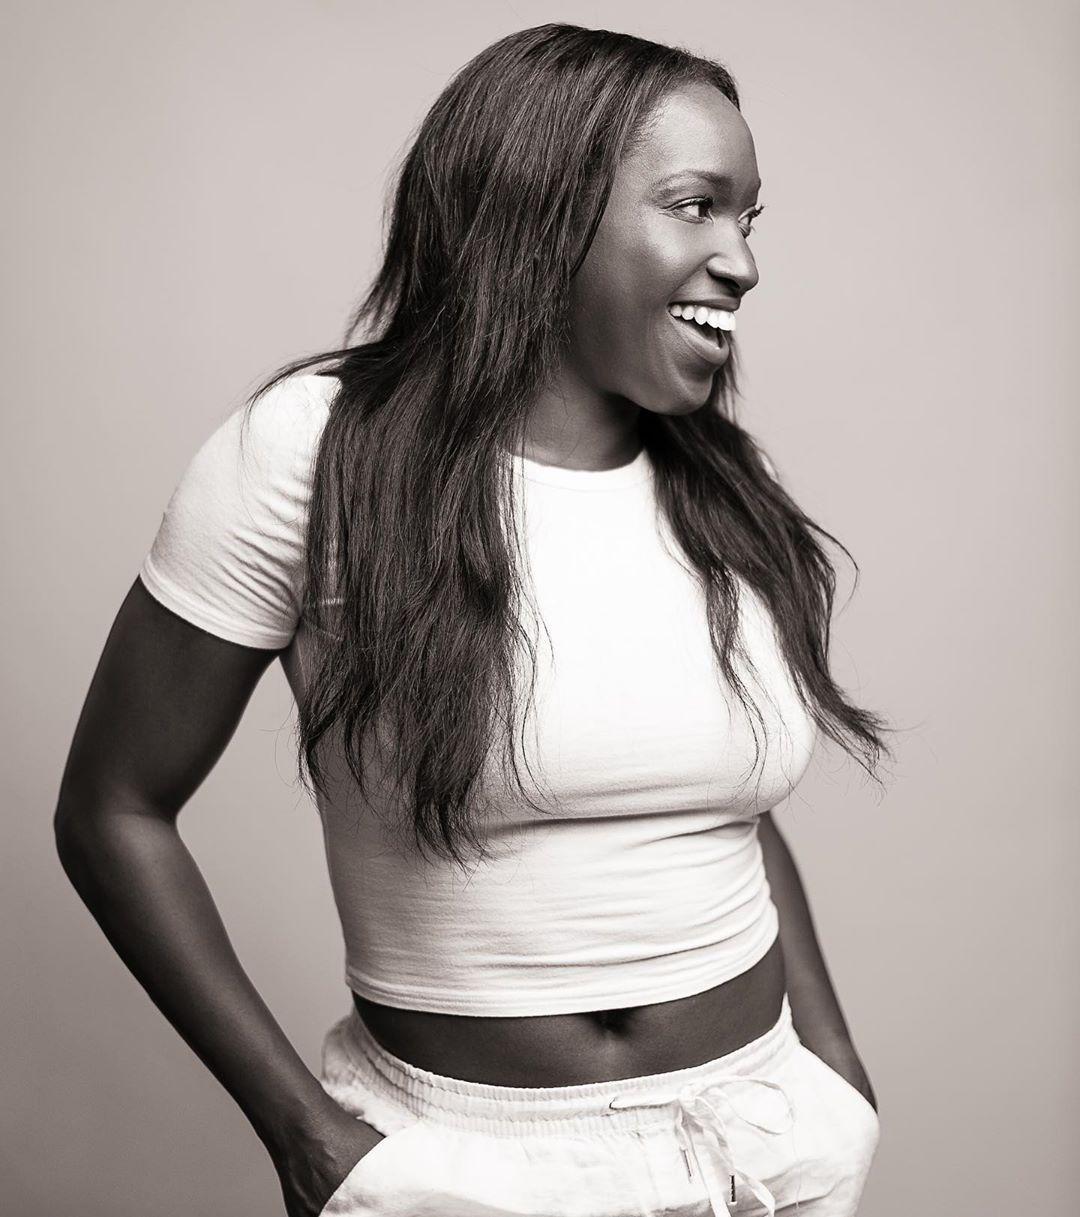 She is Black History 💯...She is Black History 💯  ———————————————————  www.jamesbickhamvisuals.com  ——————————————————— #blackhistorymonth  #Blackhistory  #fashionmodels  #outfitideas4you  #modelworld  #BlackDoctors  #jamaicanmusic  #melaninpoppin  #modelingagencies  #jamaicanmodel  #modelingphotography  #modelposes  #jamaica🇯🇲 #portrait_ig  #portraitperfection  #portrait_universe  #doports  #melanin  #wmportraits  #777luckyfish